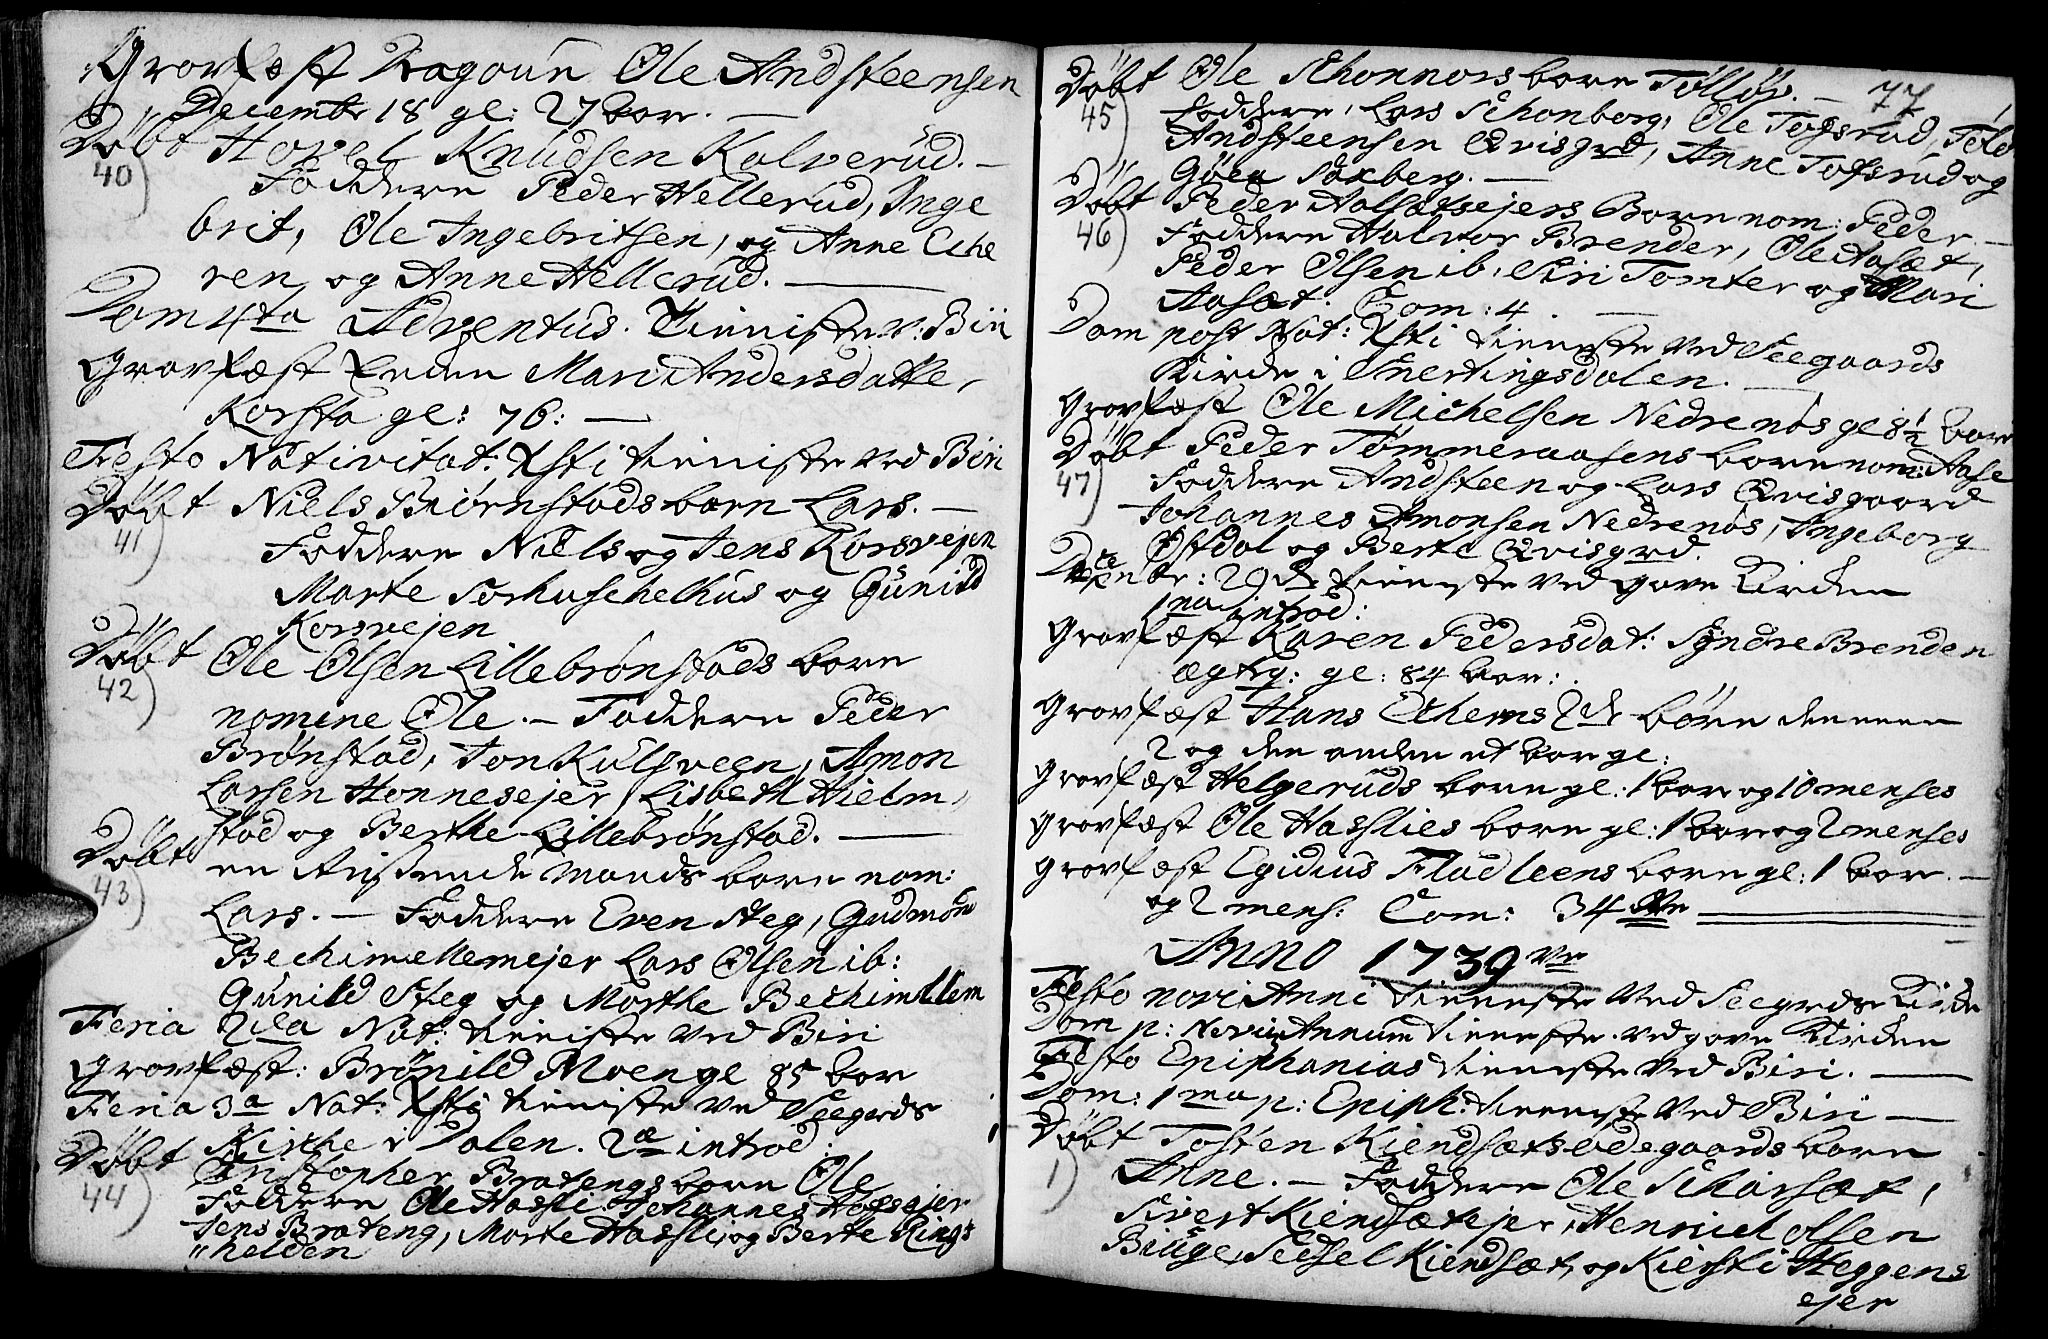 SAH, Biri prestekontor, Ministerialbok nr. 1, 1730-1754, s. 77